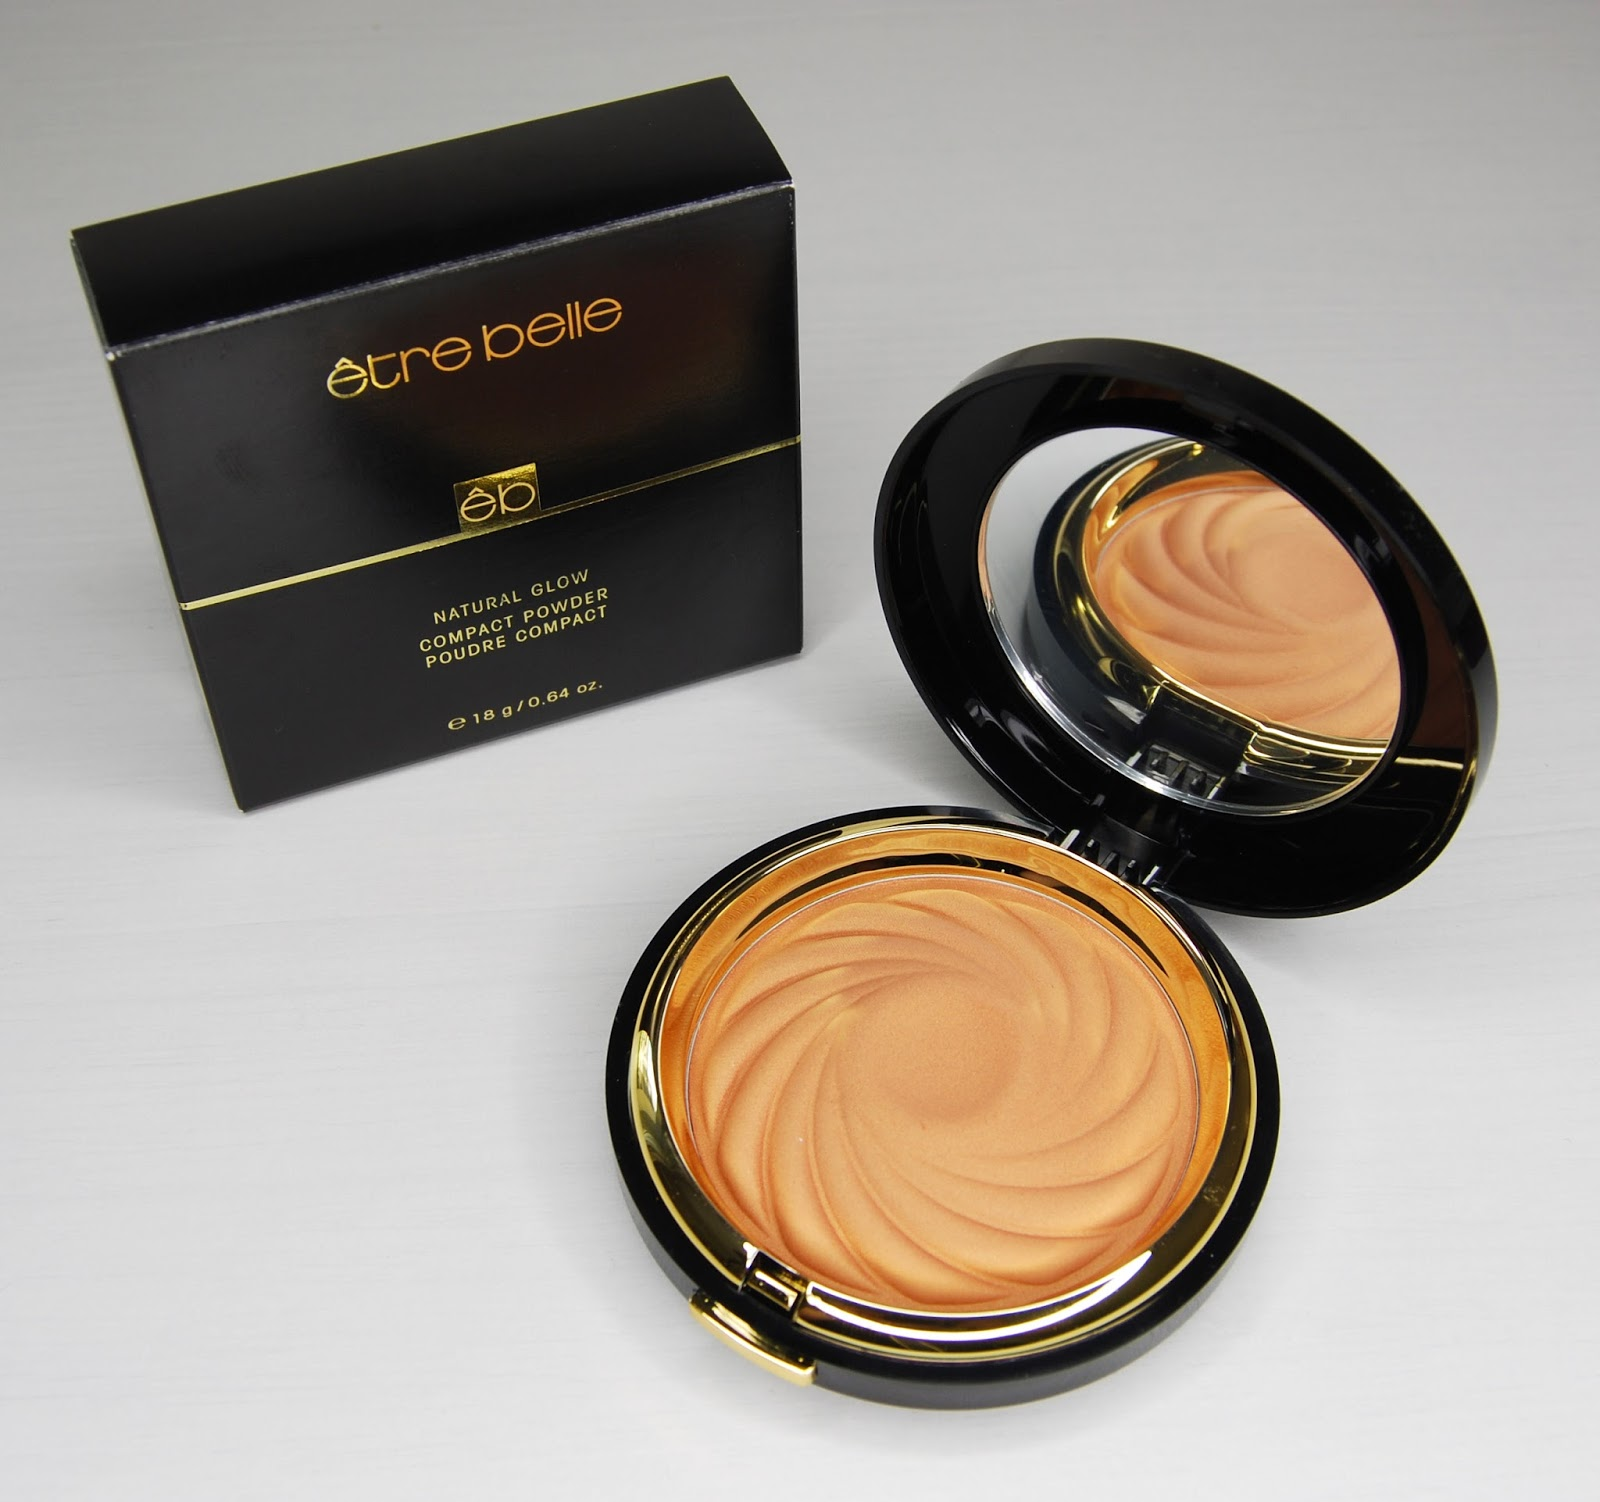 http://pannazalotka.blogspot.com/2014/09/recenzja-natural-glow-compact-powder-od.html